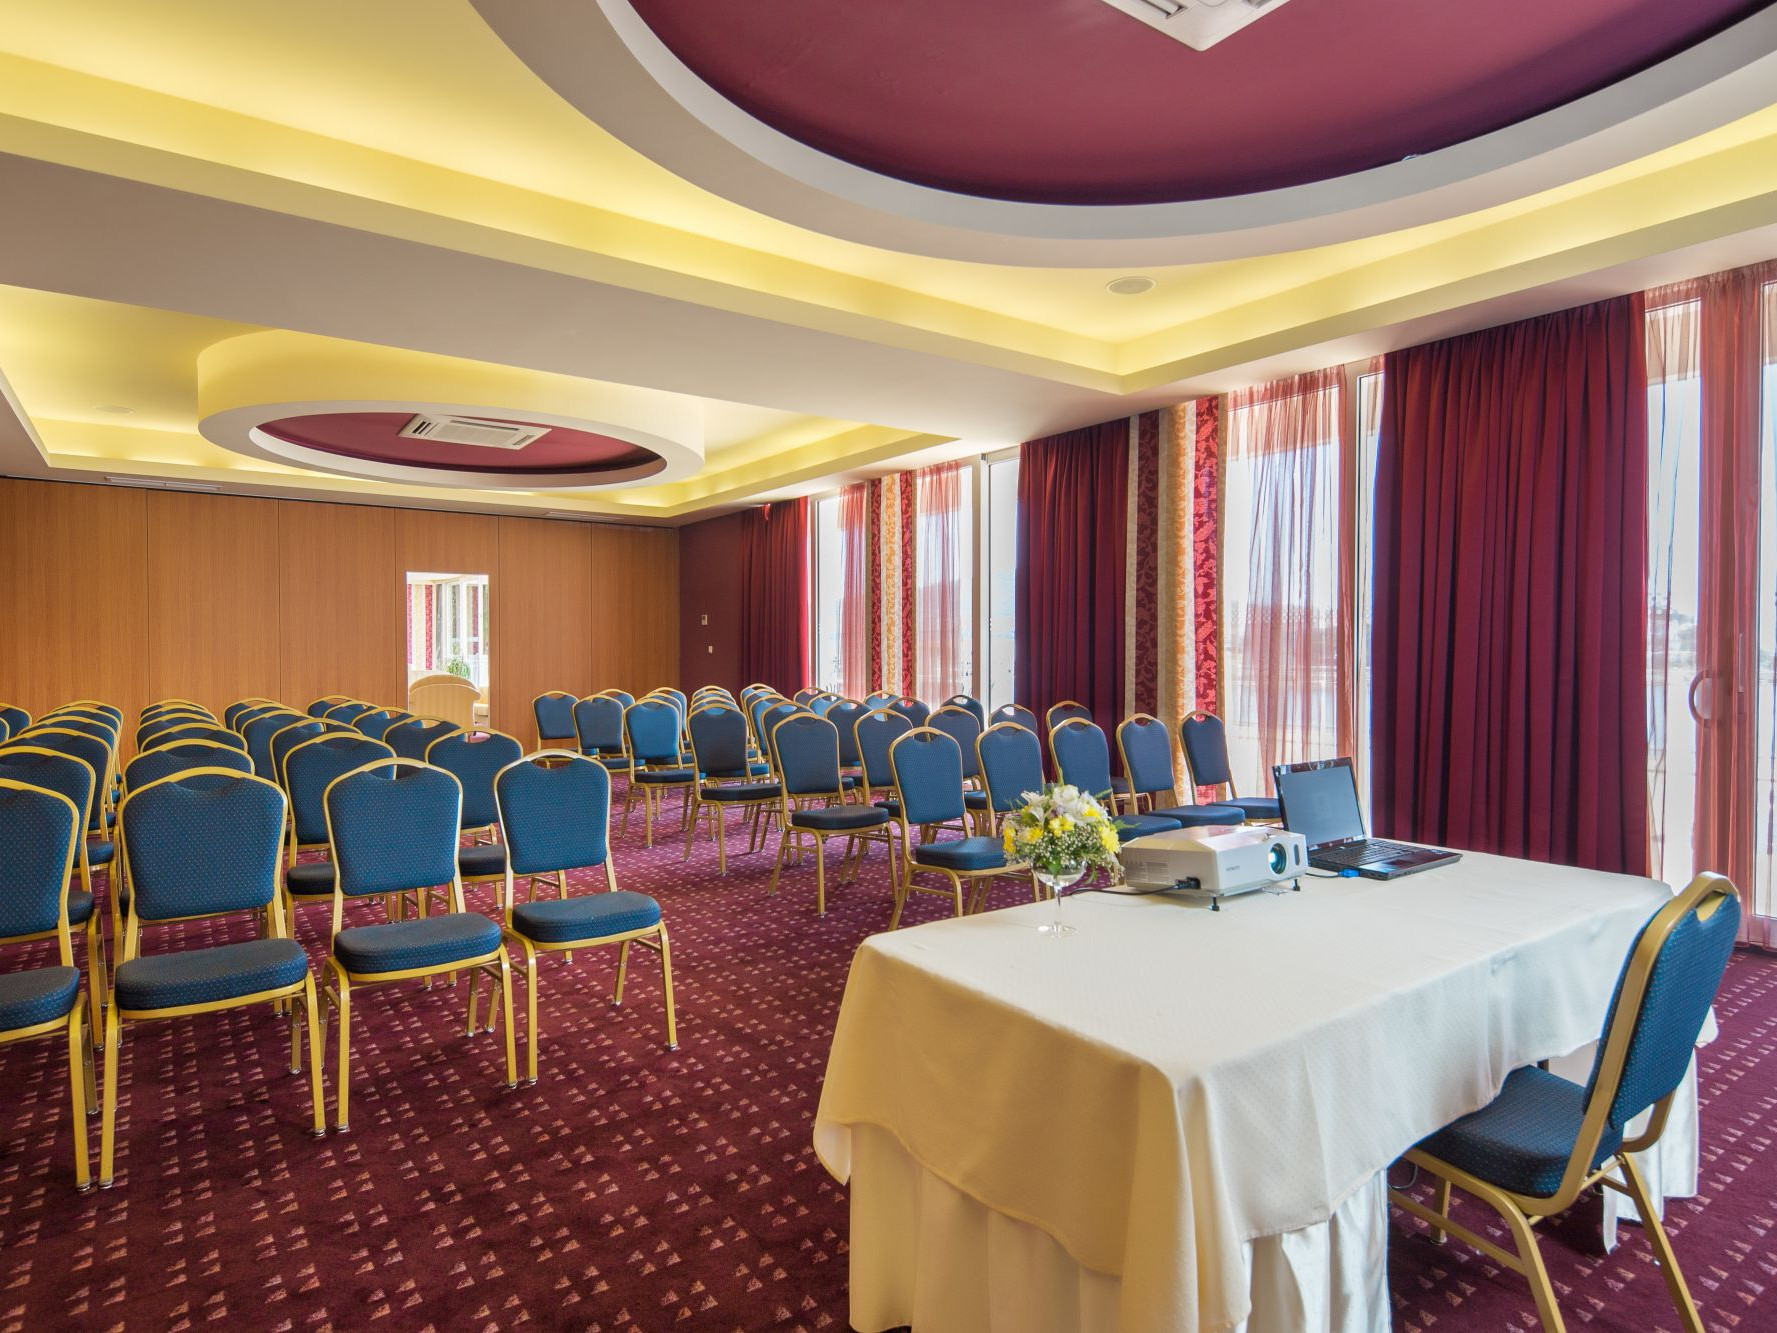 congress hall penkala ii 03 14639418809 o uai - Zora Hotel